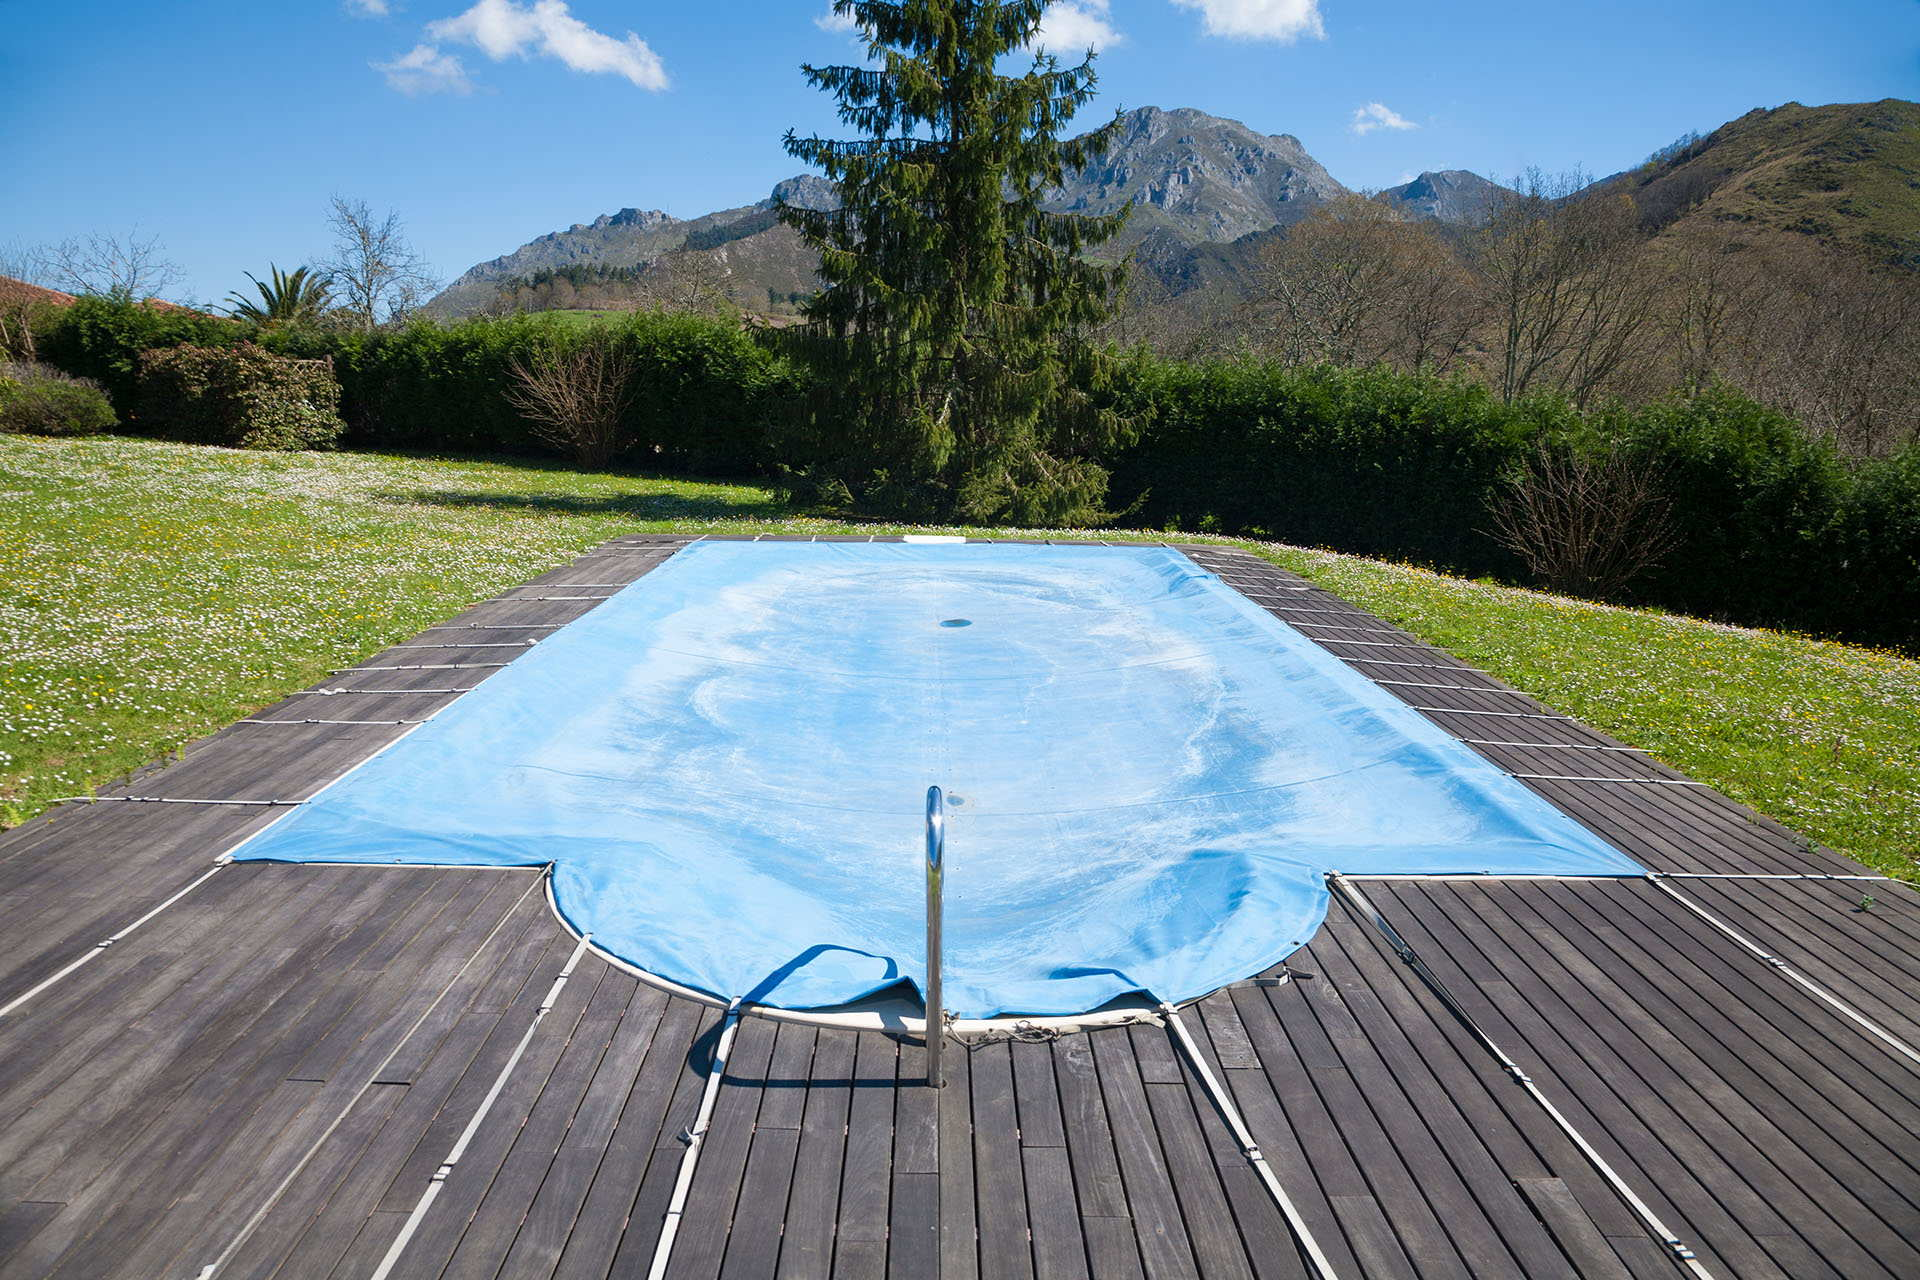 Pool Protection